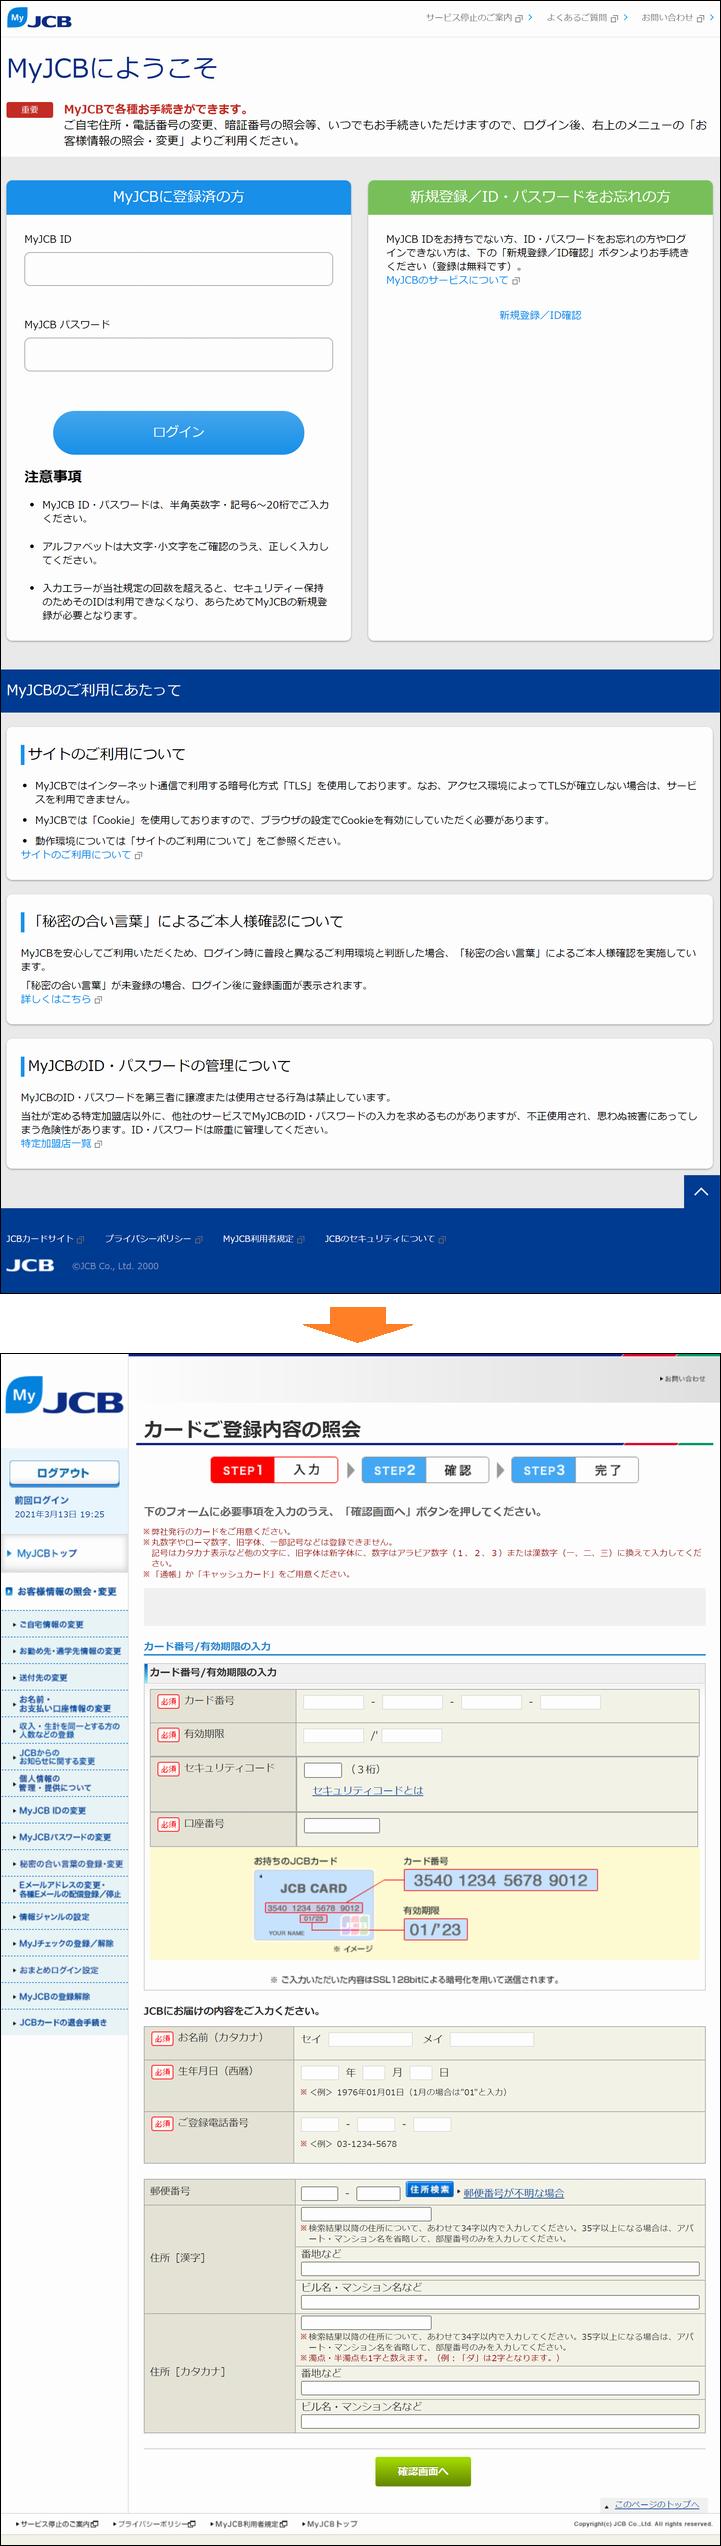 Jcb まい 「カードの不正使用を検知し凍結した」とする、MyJCB偽メール(フィッシング対策協議会)